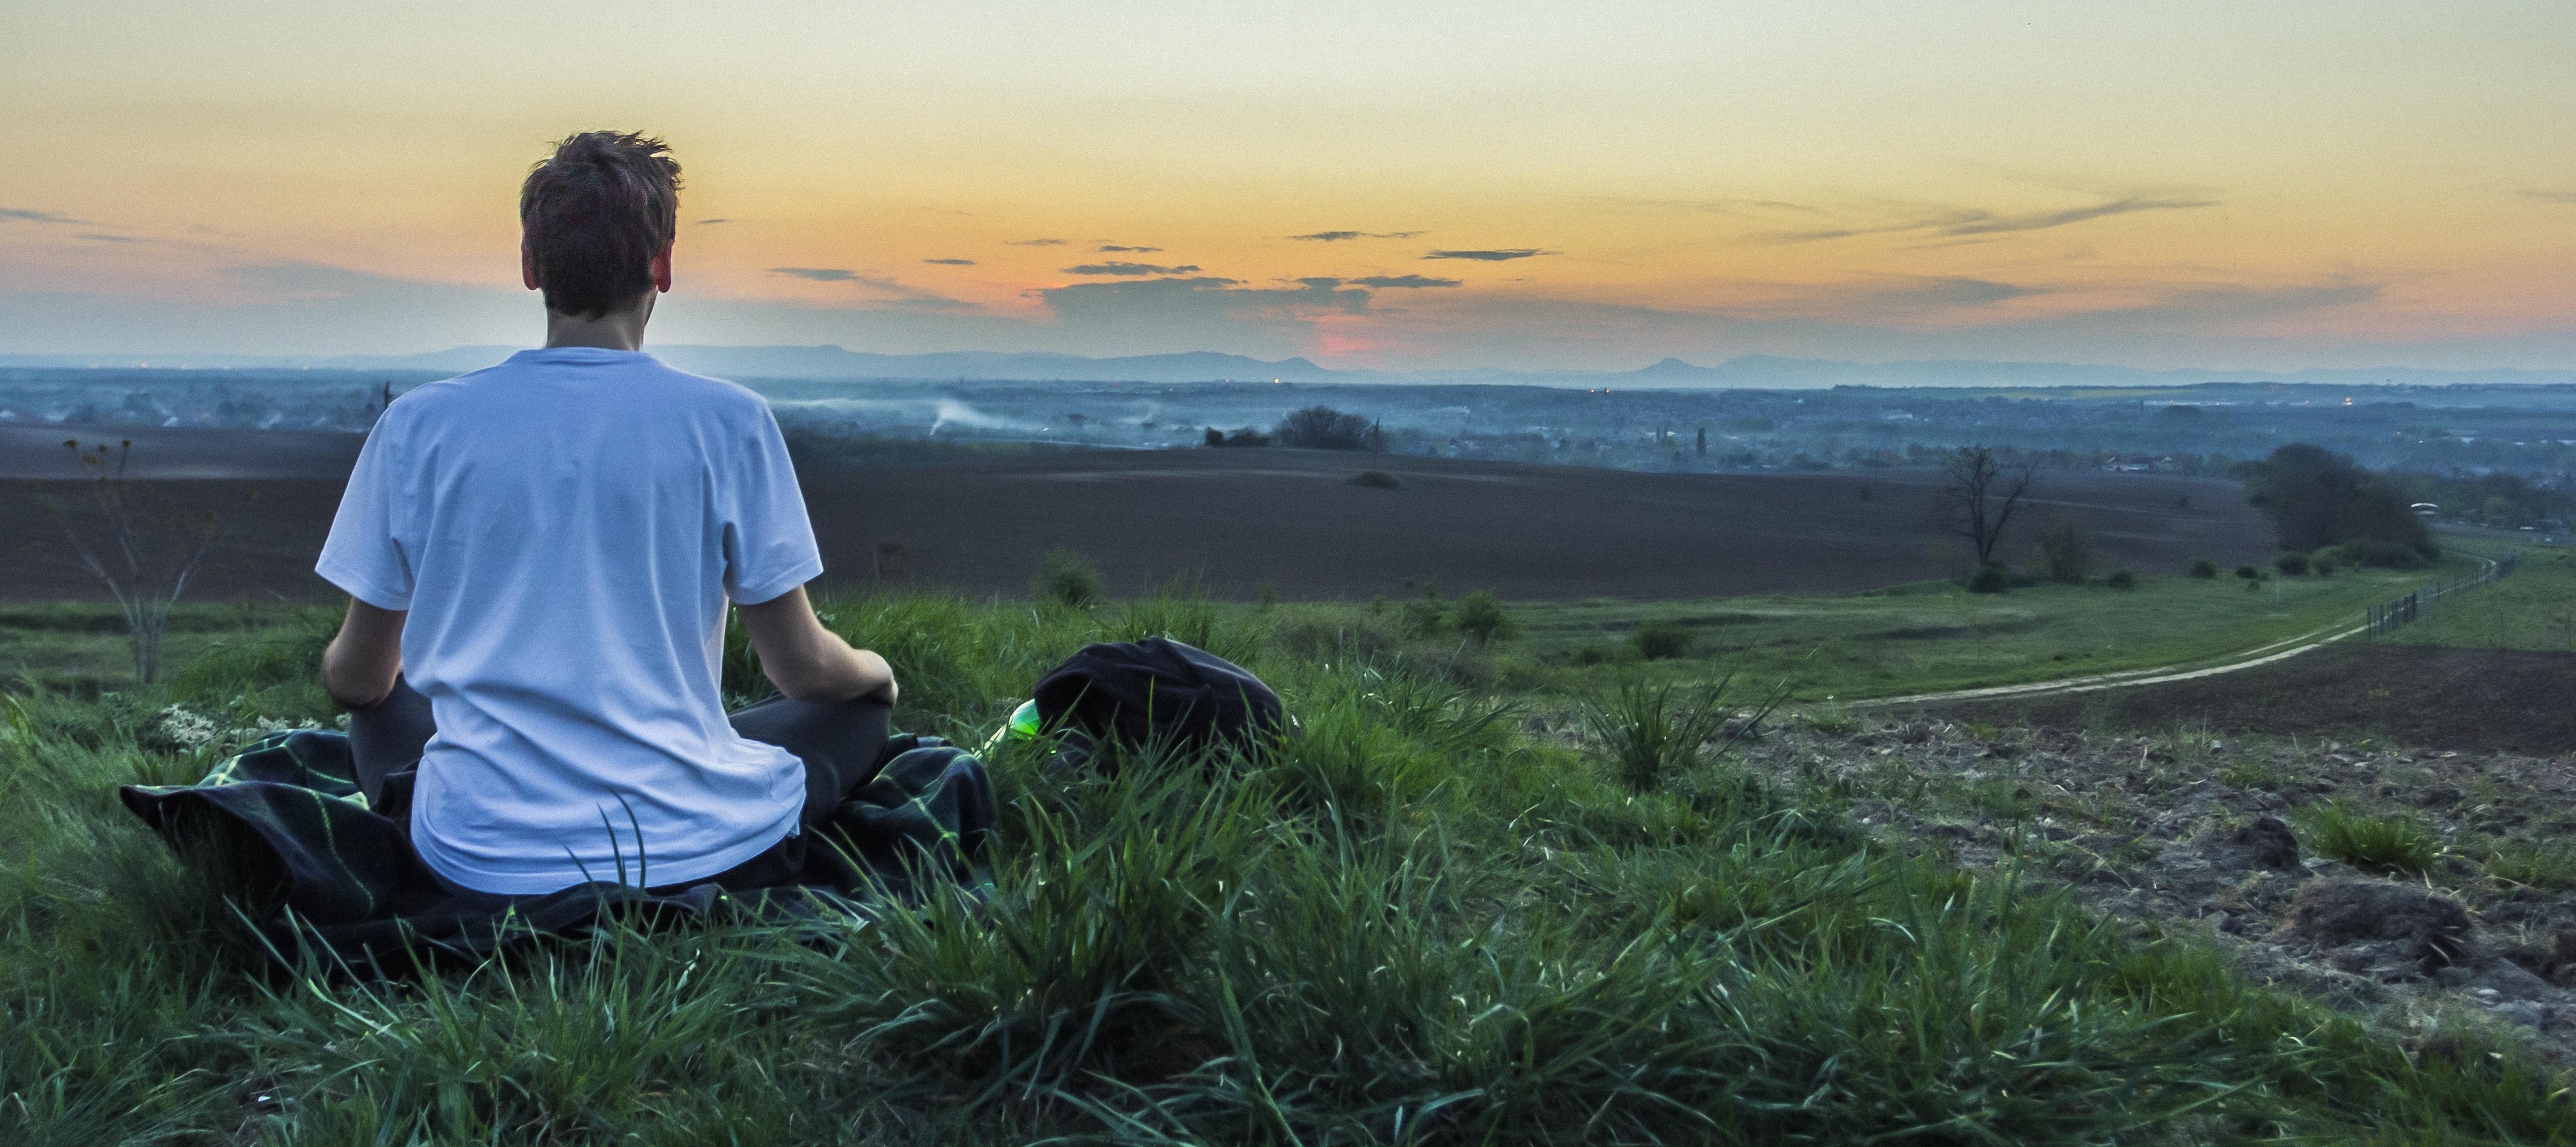 Mindfulness, sentarse y no hacer nada